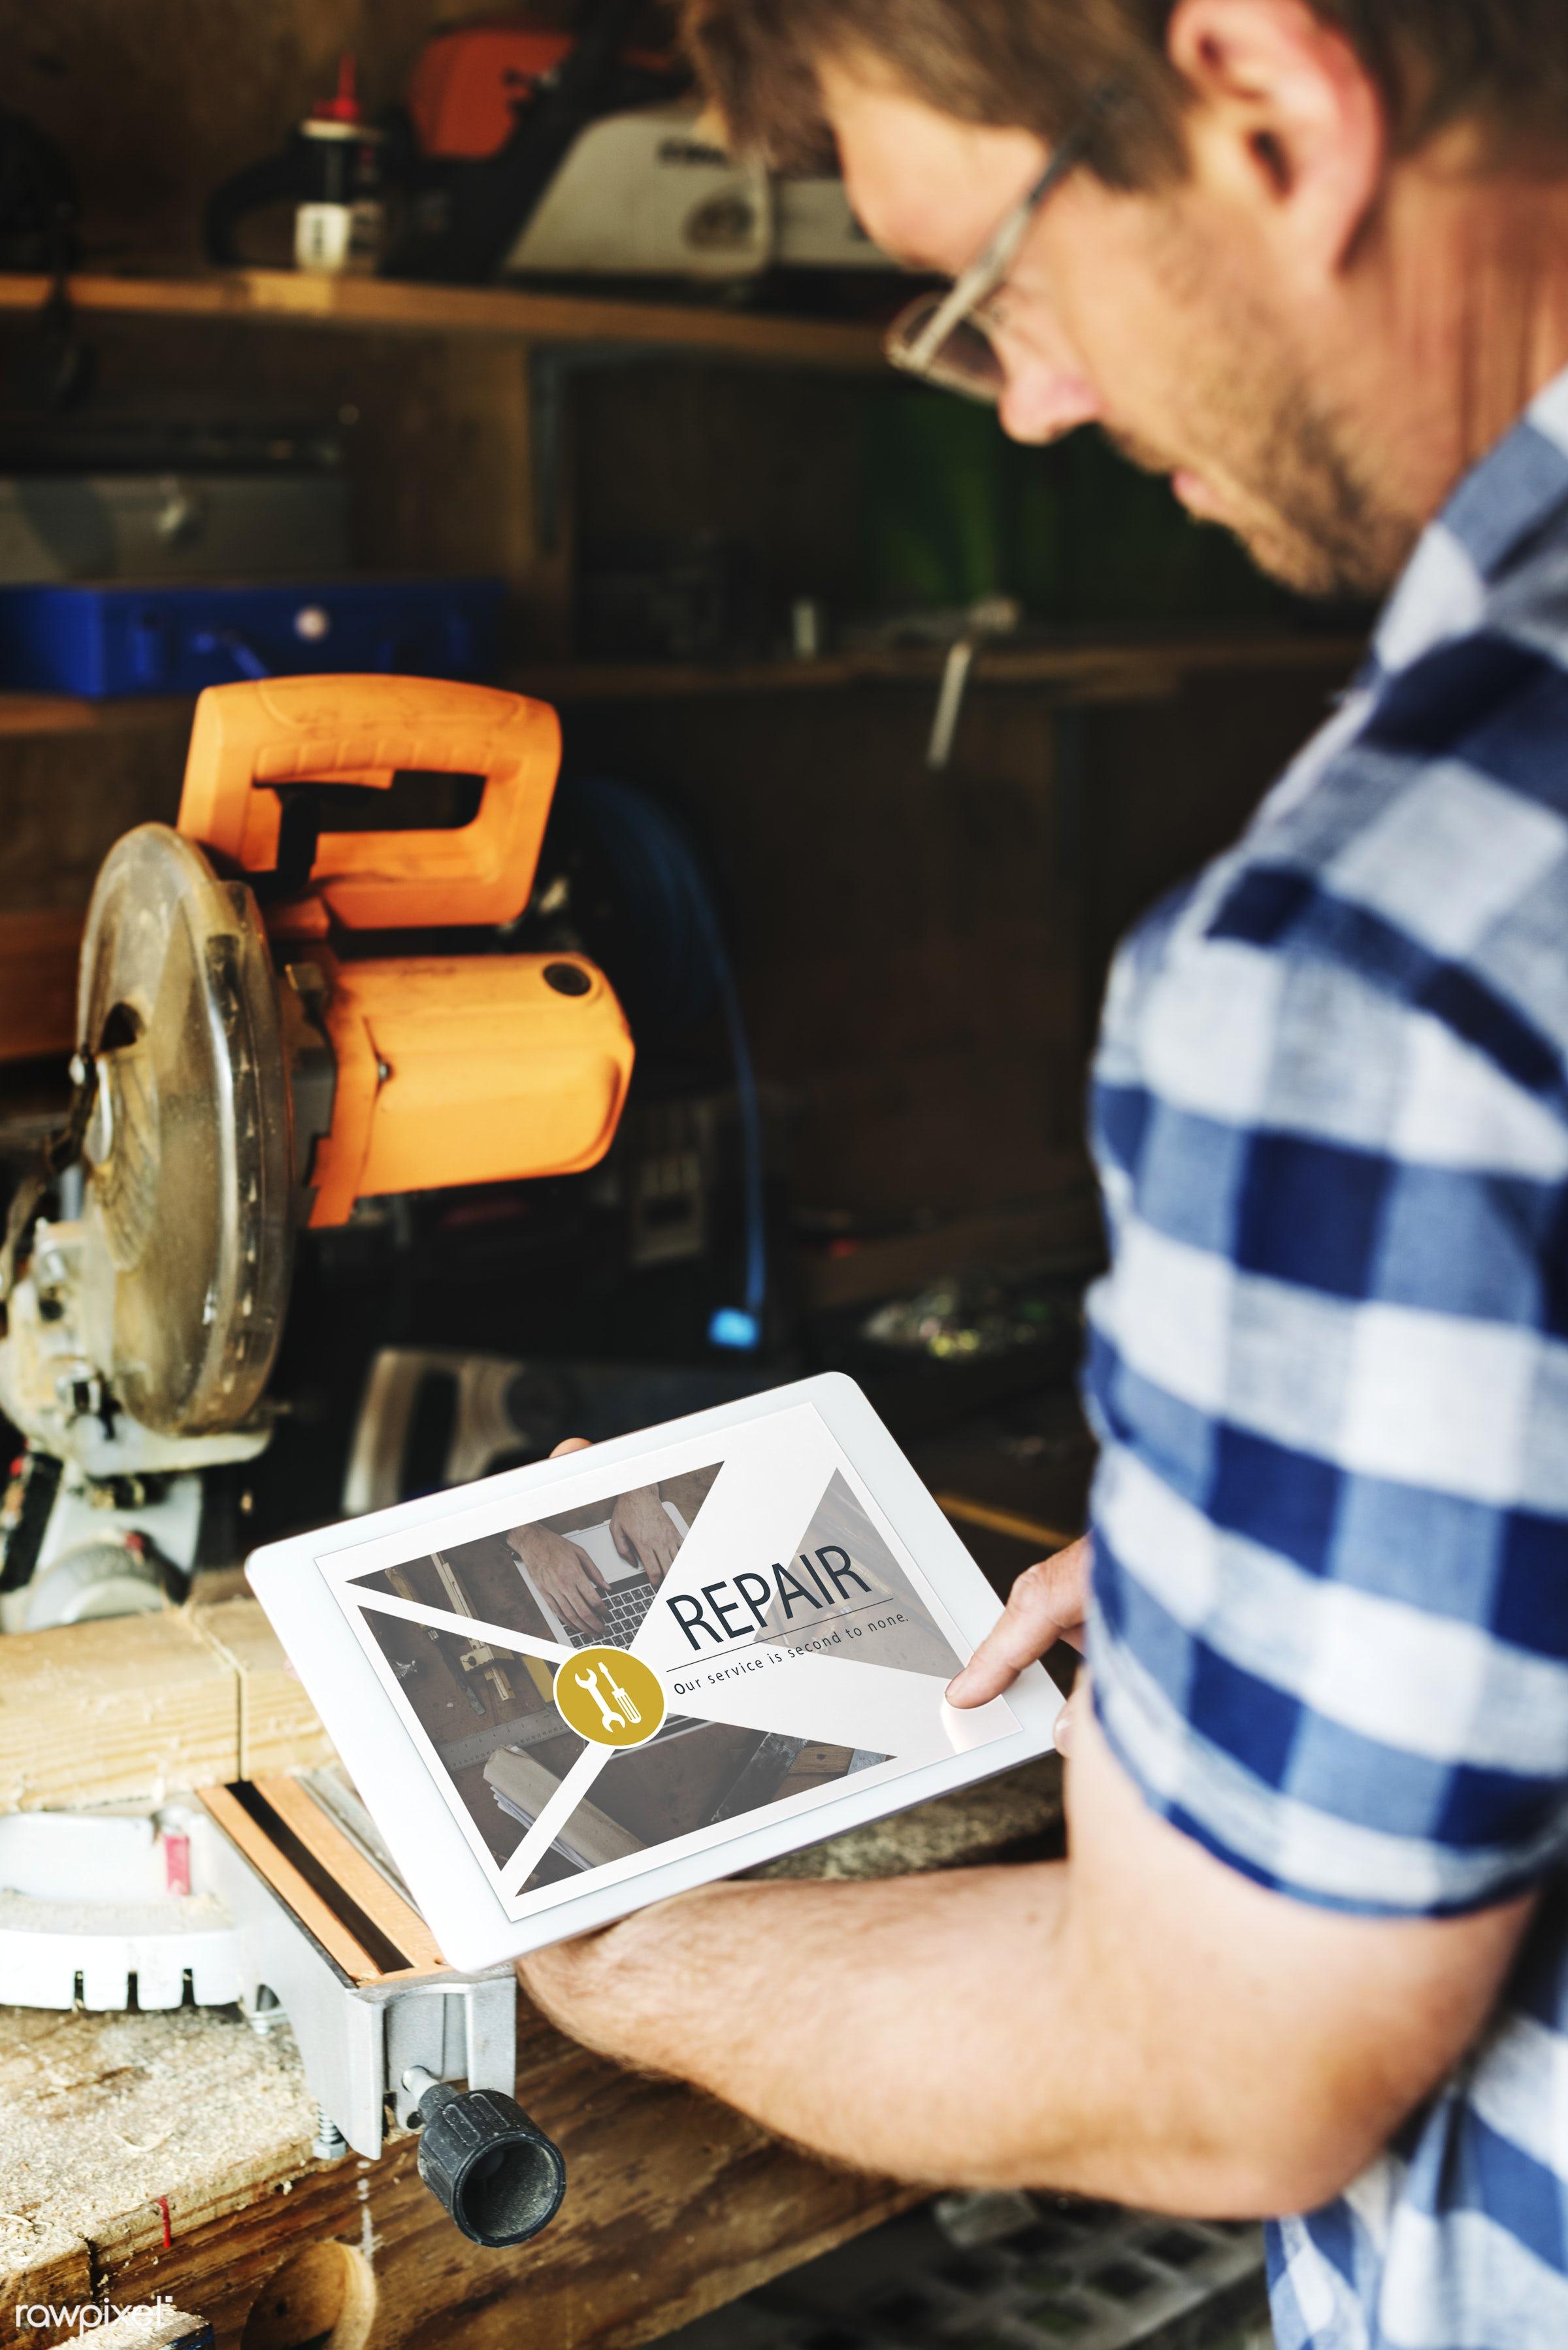 adult, carpenter, carpentry, chop, construction, digital, digital tablet, equipment, fix, fixing, gadget, holding, industry...